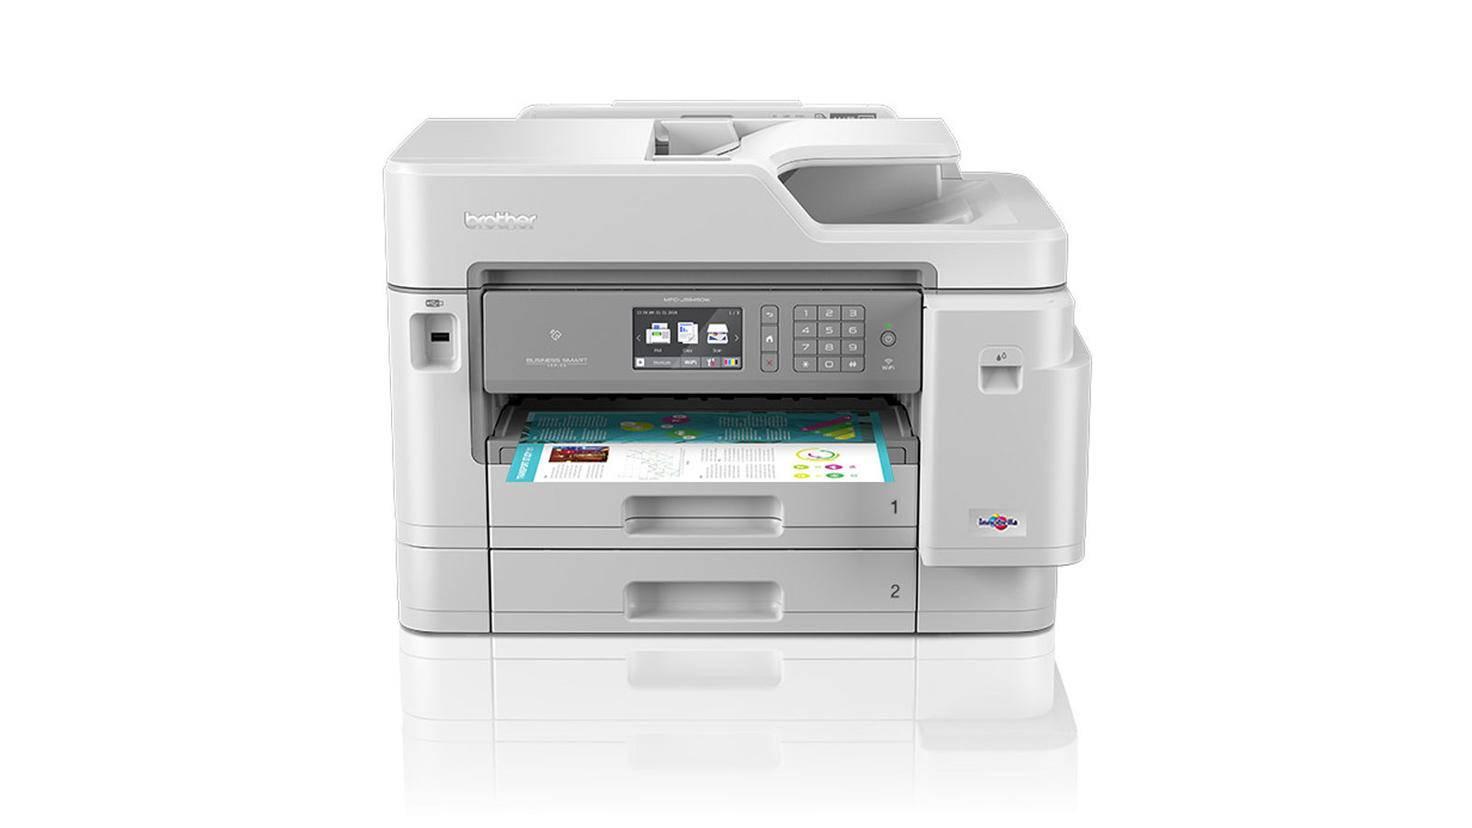 Multifunktionsdrucker Brother MFC-J5945DW